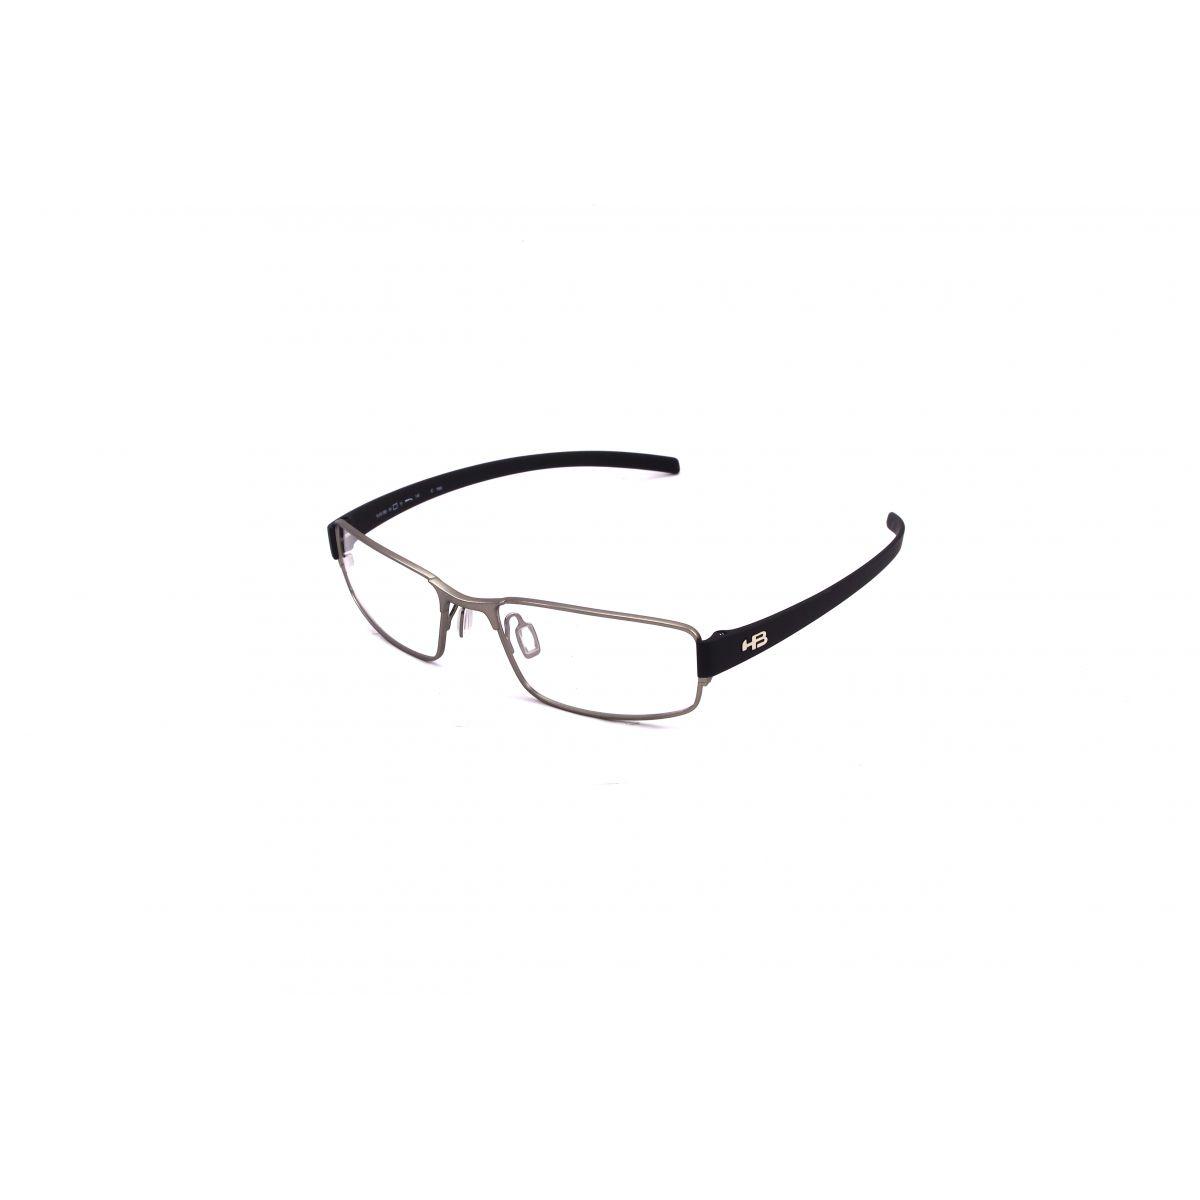 c7e11305c Óculos de Grau Masculino HB M93069166 Tam. 54HBHB de GrauCompra ...